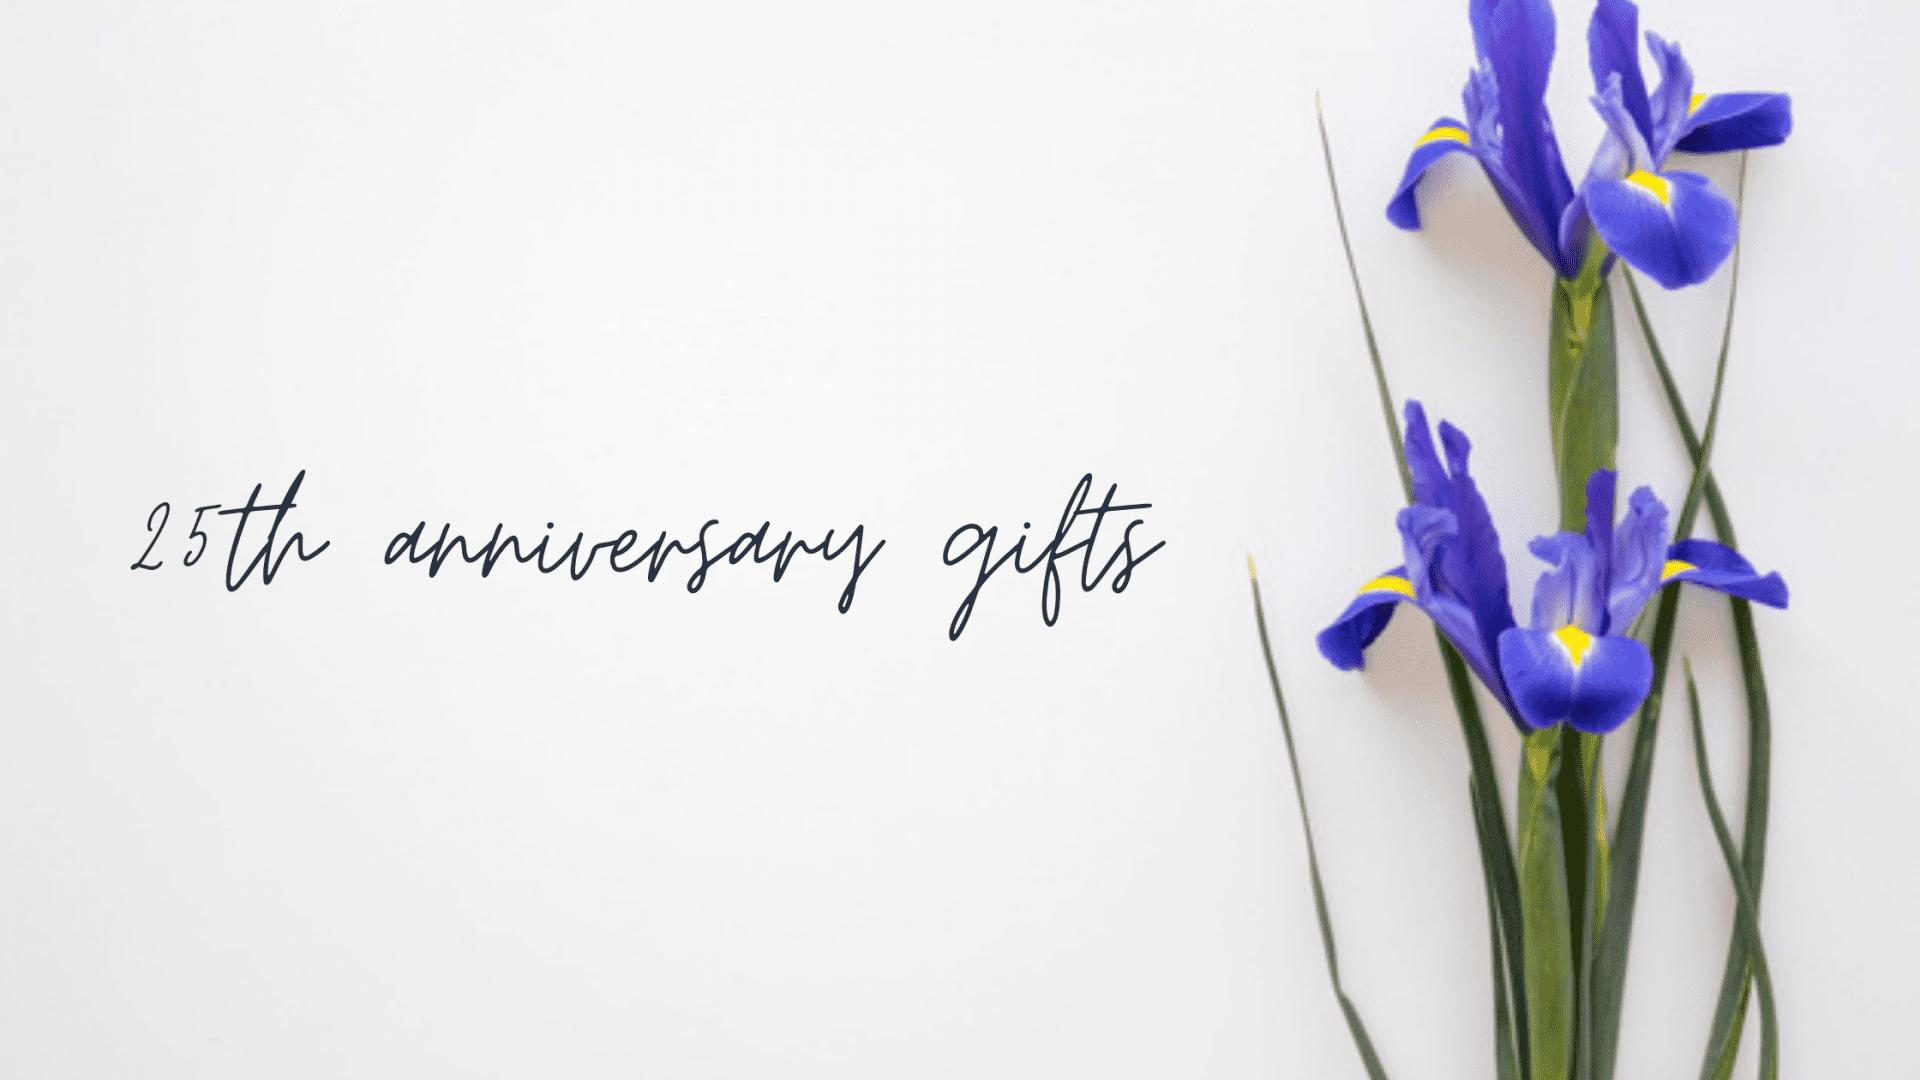 25th anniversary gifts - thumbnail